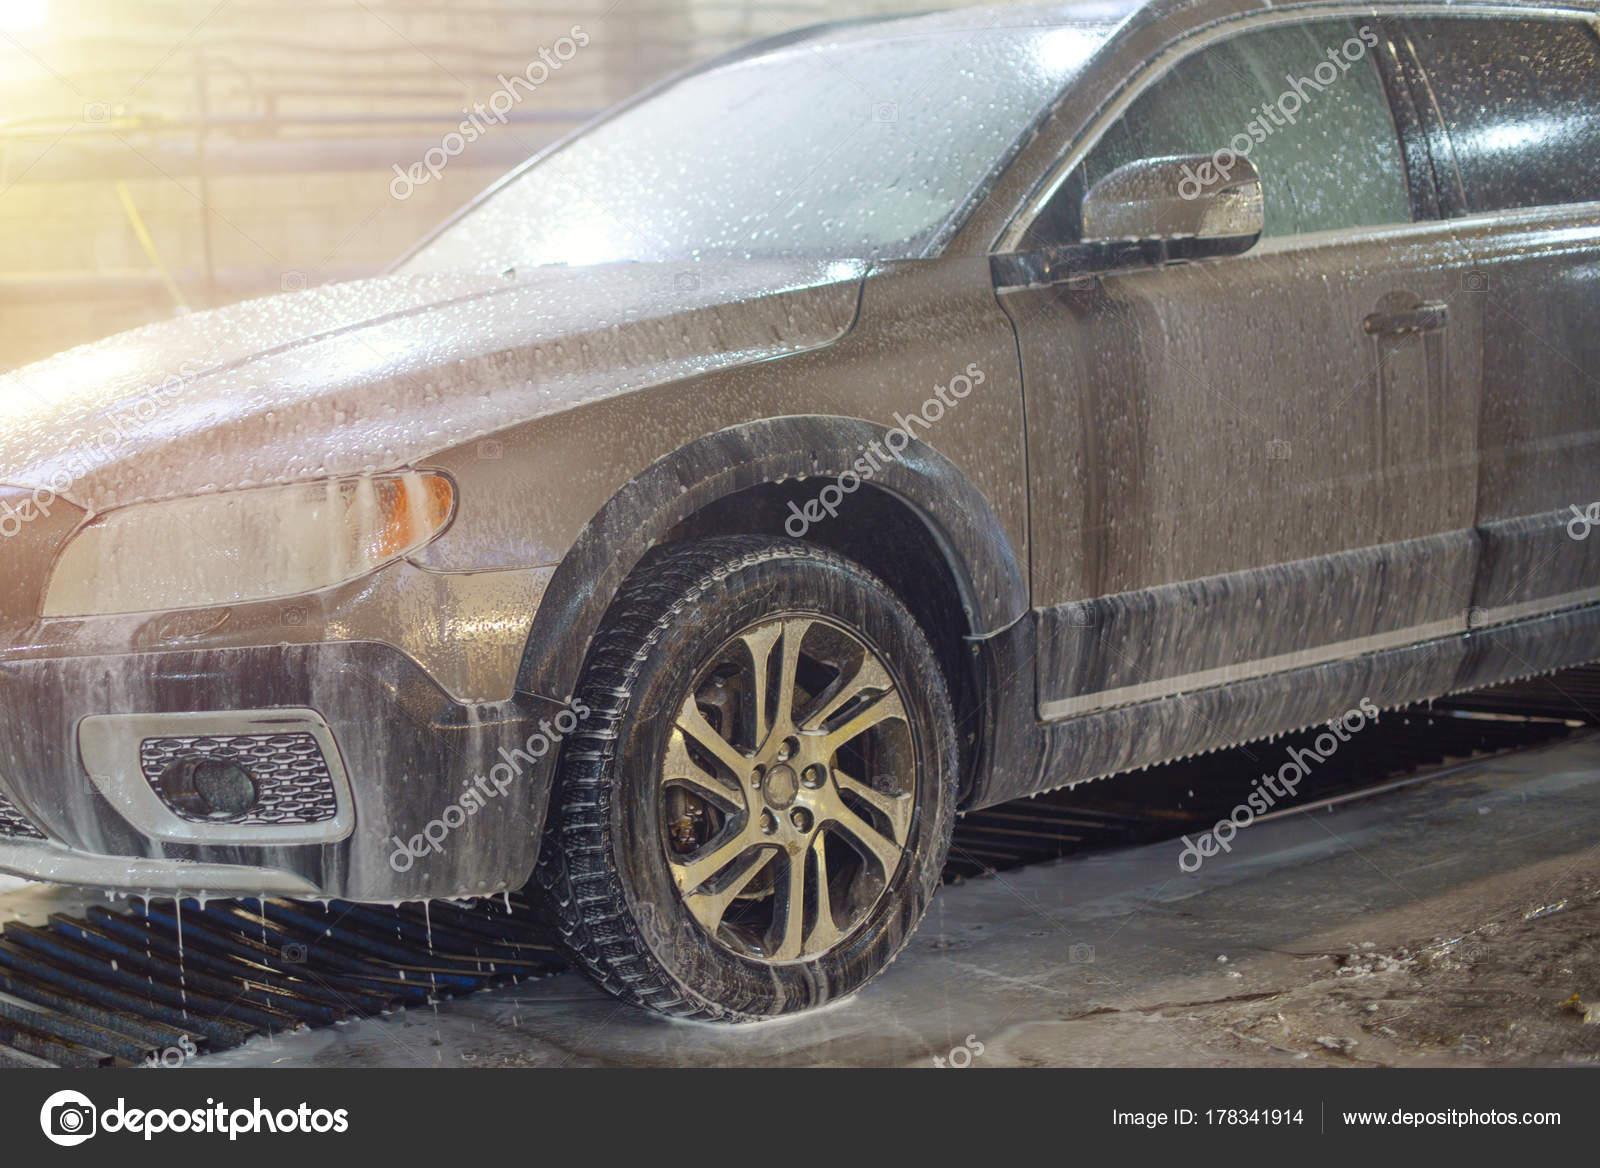 lavage int rieur voiture sale photographie klavdiyav 178341914. Black Bedroom Furniture Sets. Home Design Ideas